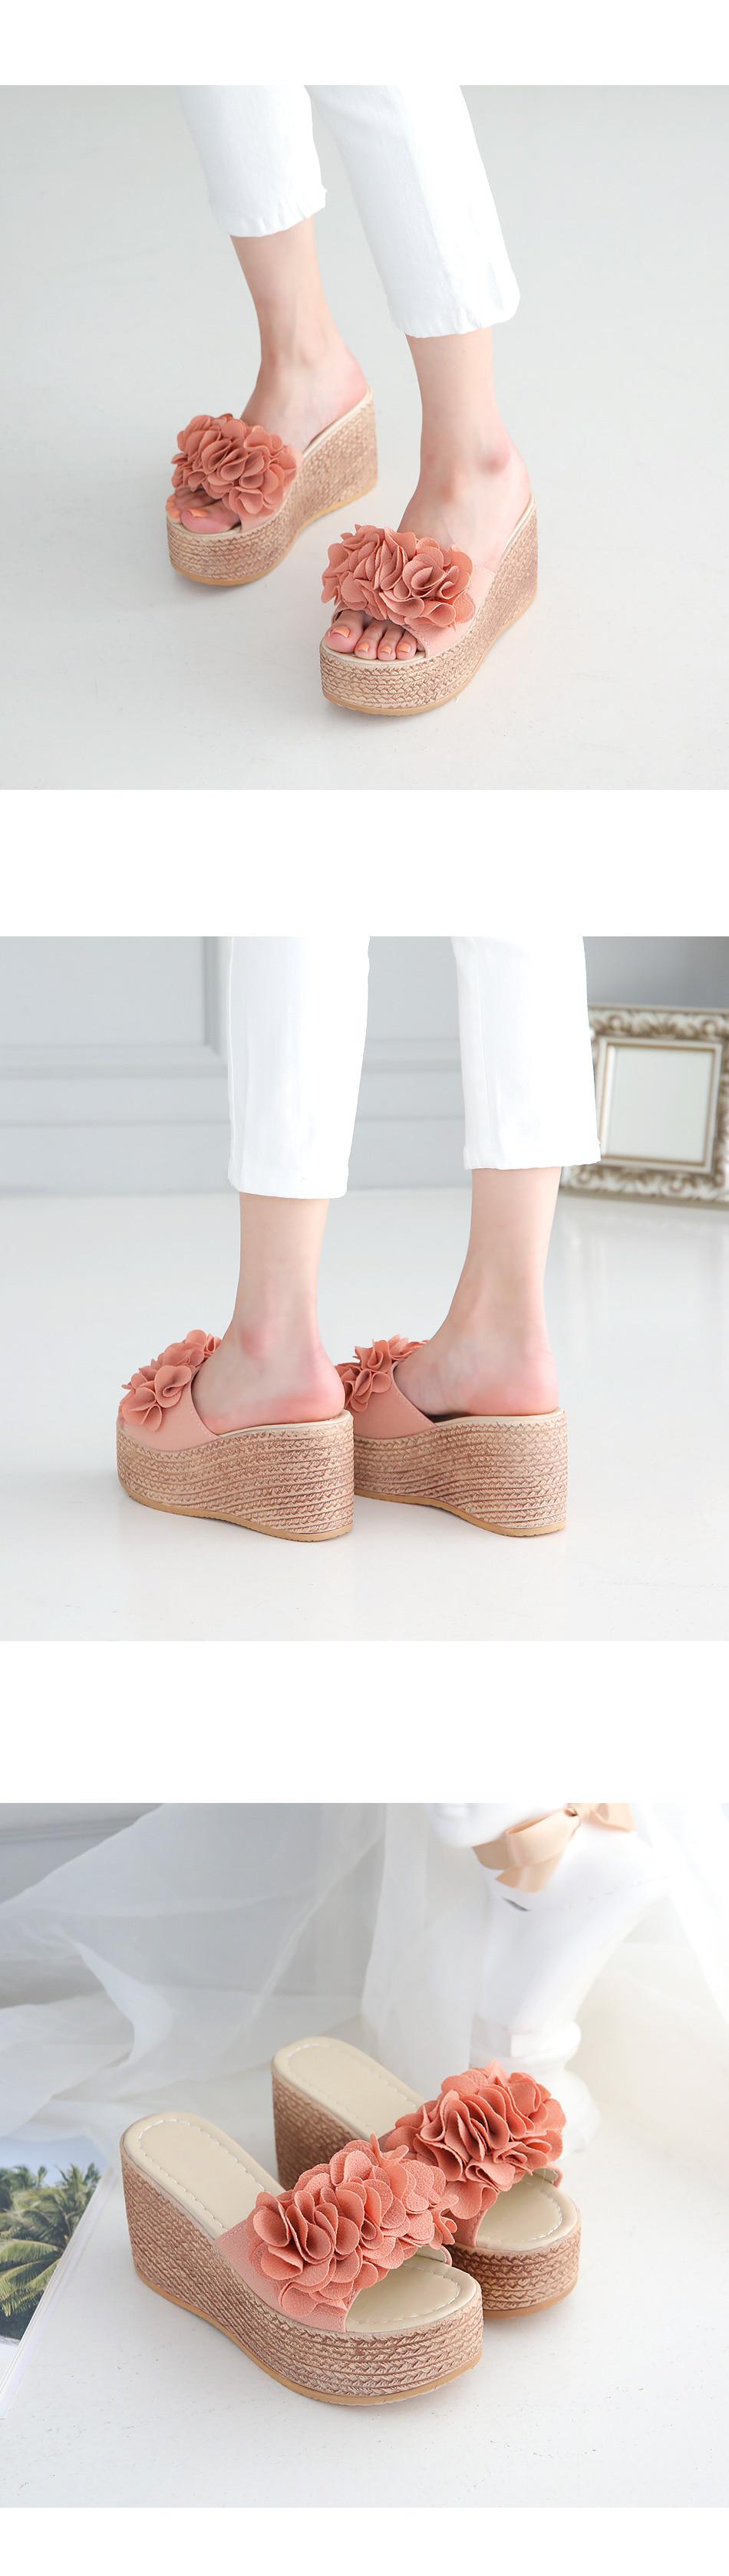 Purense hose wedge slippers 9cm